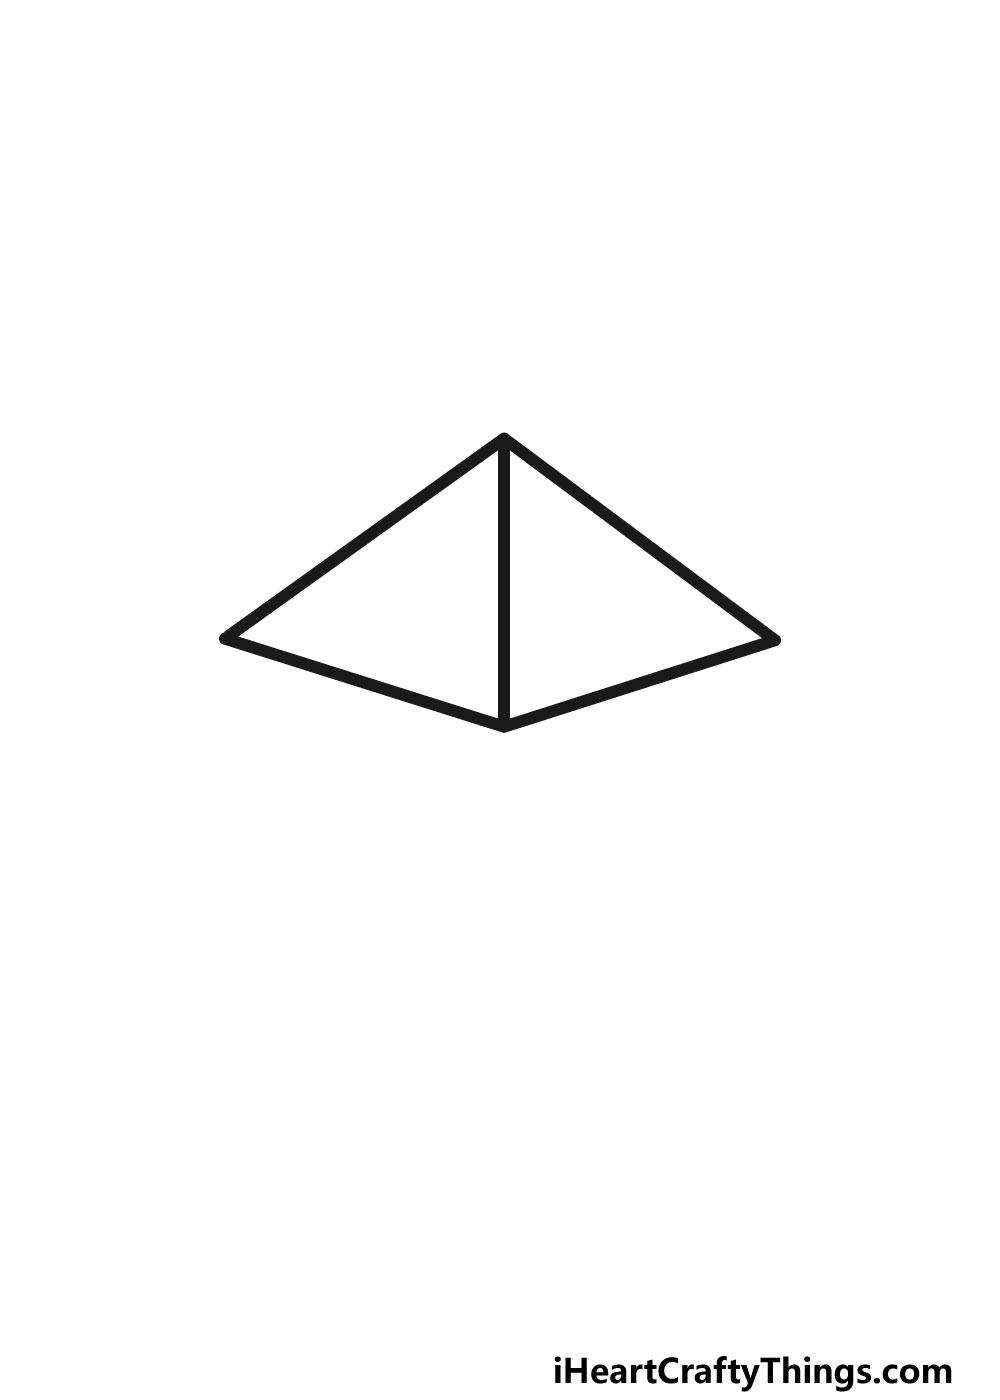 drawing a pentagon step 2